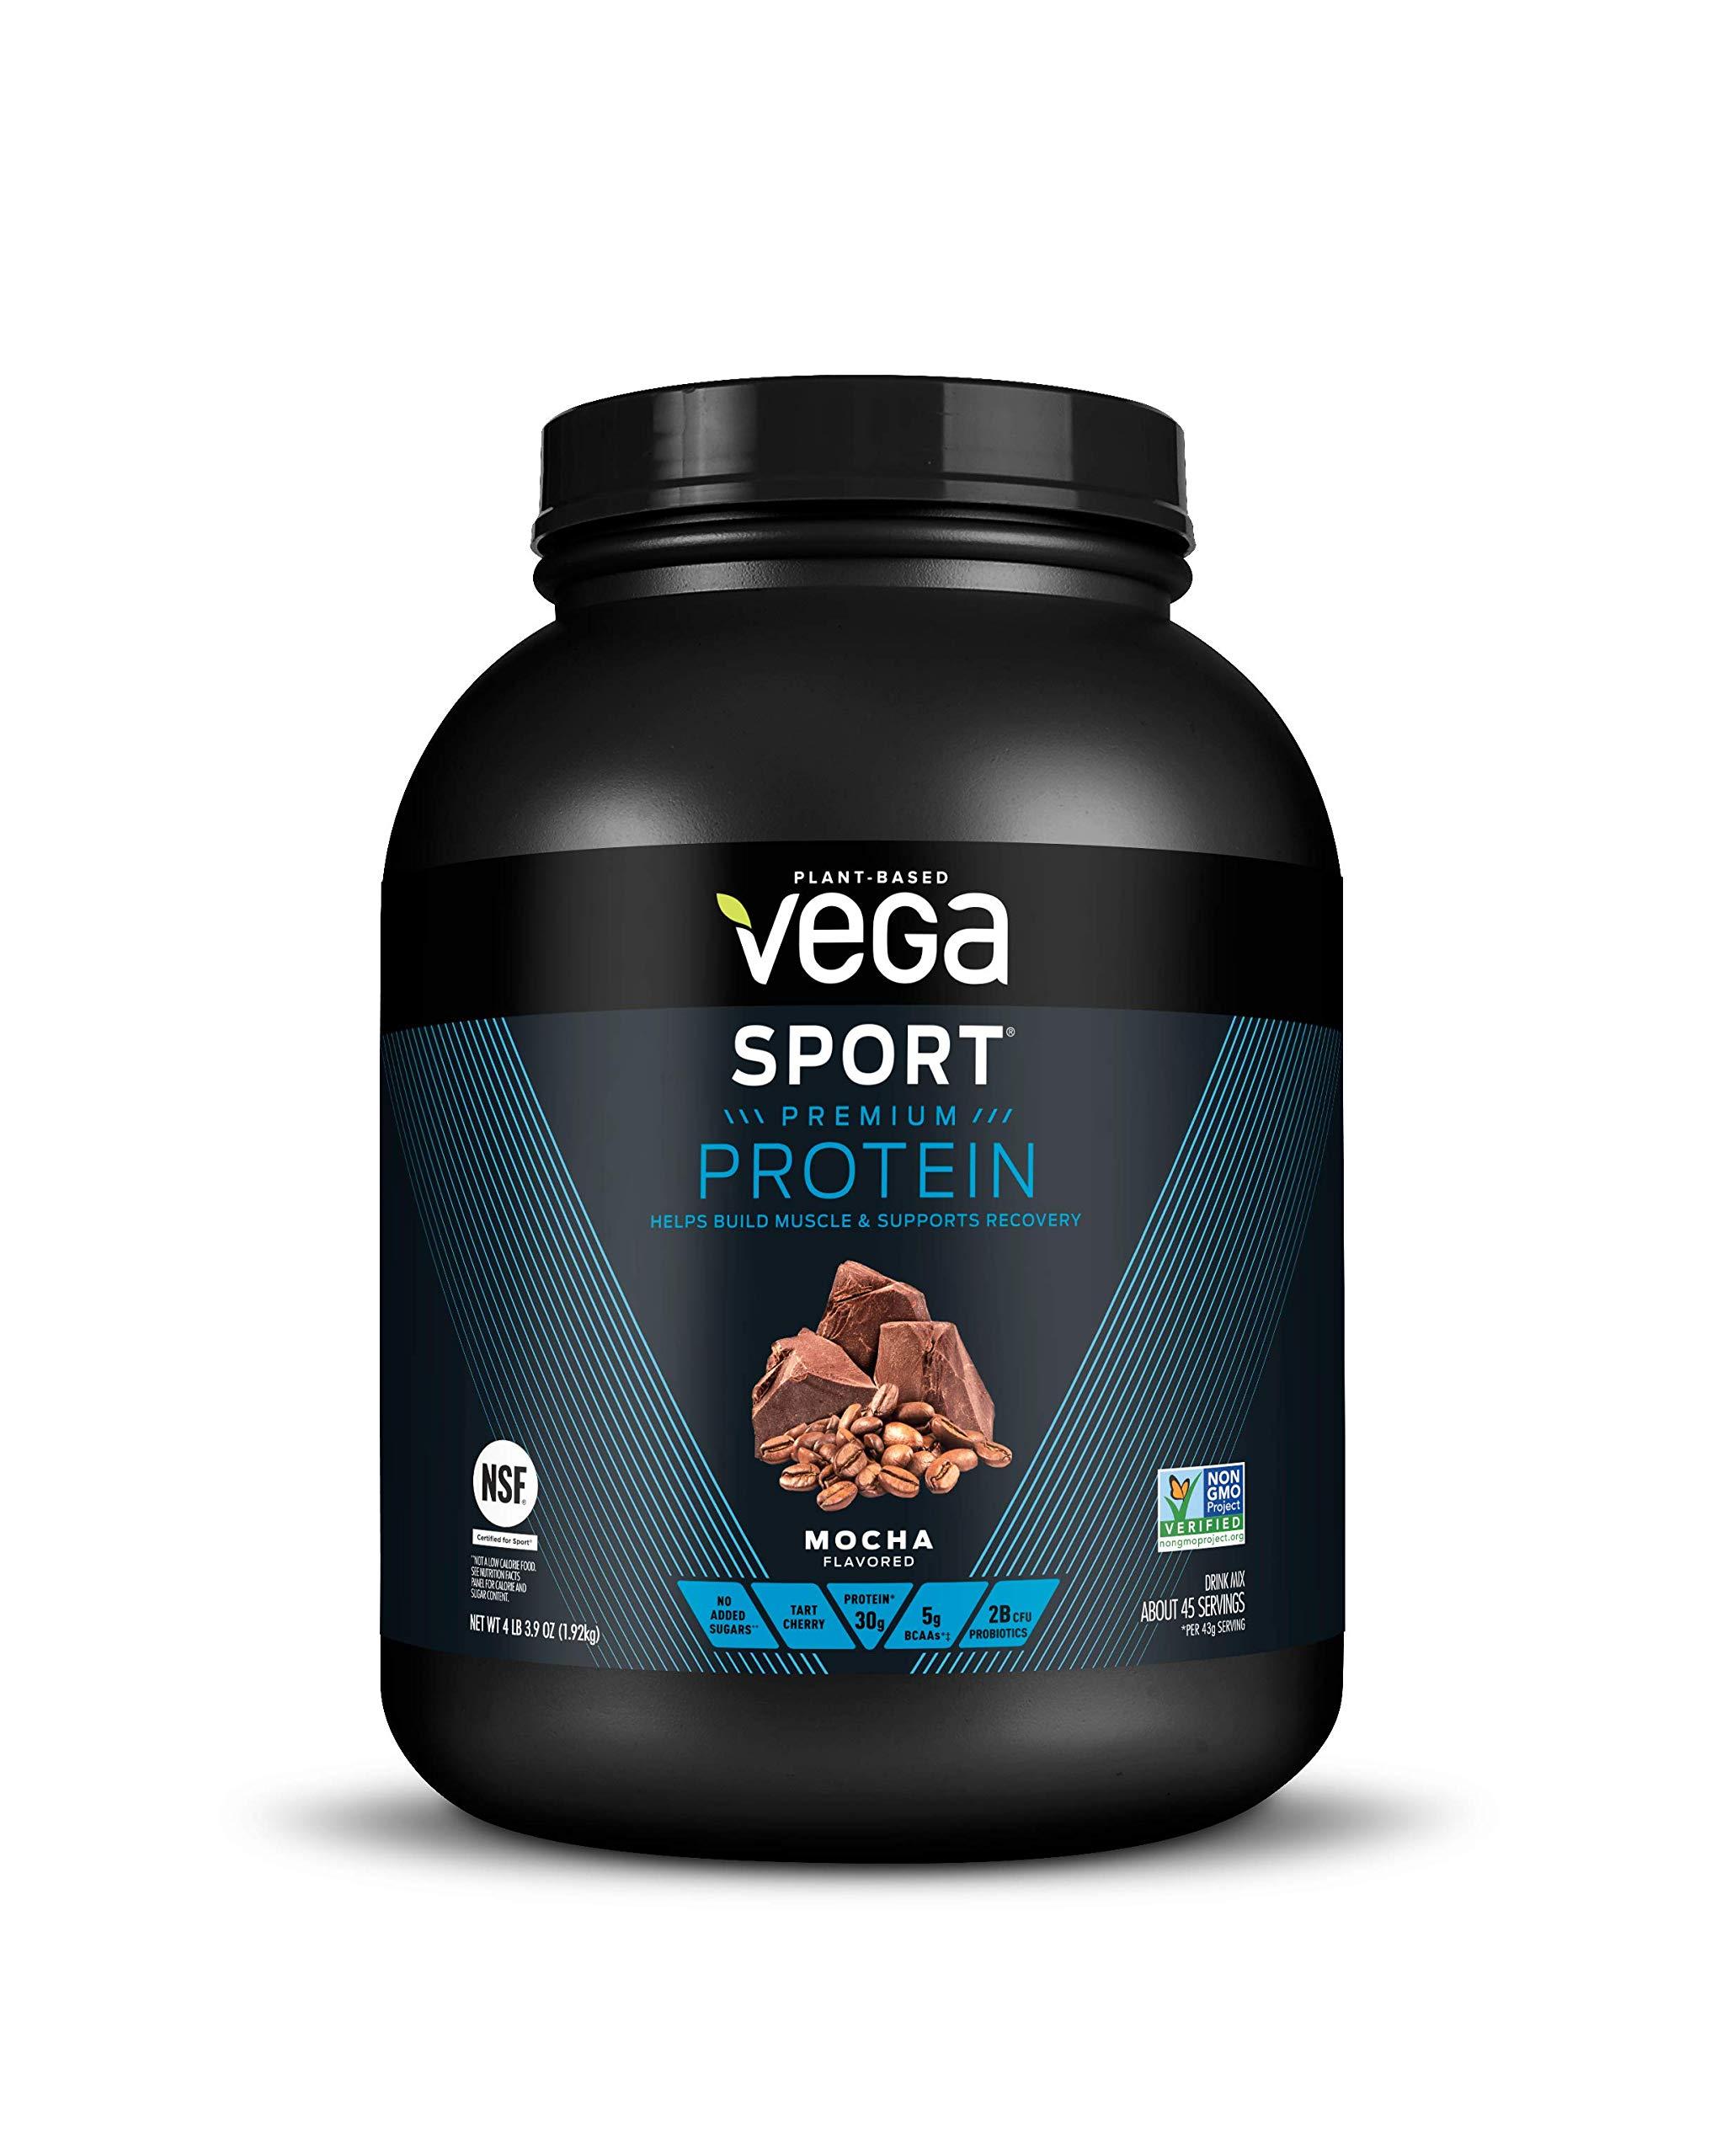 Vega Sport Protein Powder Mocha (45 Servings, 4lb 3.9oz) -  Plant Based Vegan Protein Powder, BCAAs, Amino Acids, Tart Cherry, Non Dairy, Gluten Free, Non GMO (Packaging May Vary)